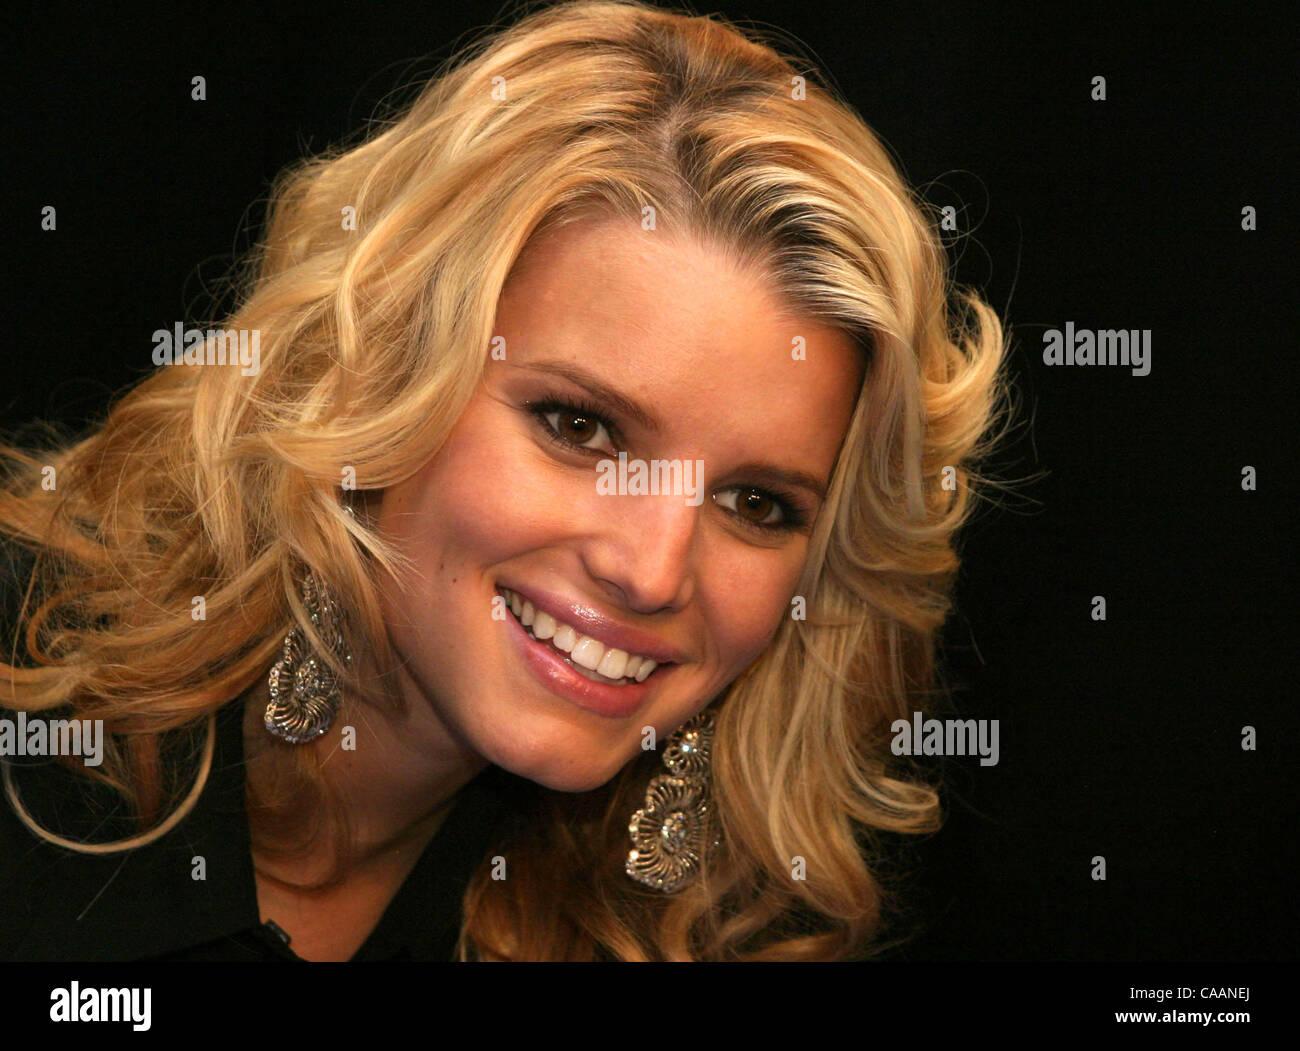 Jessica Simpson 2003 Stock Photos & Jessica Simpson 2003 Stock ...